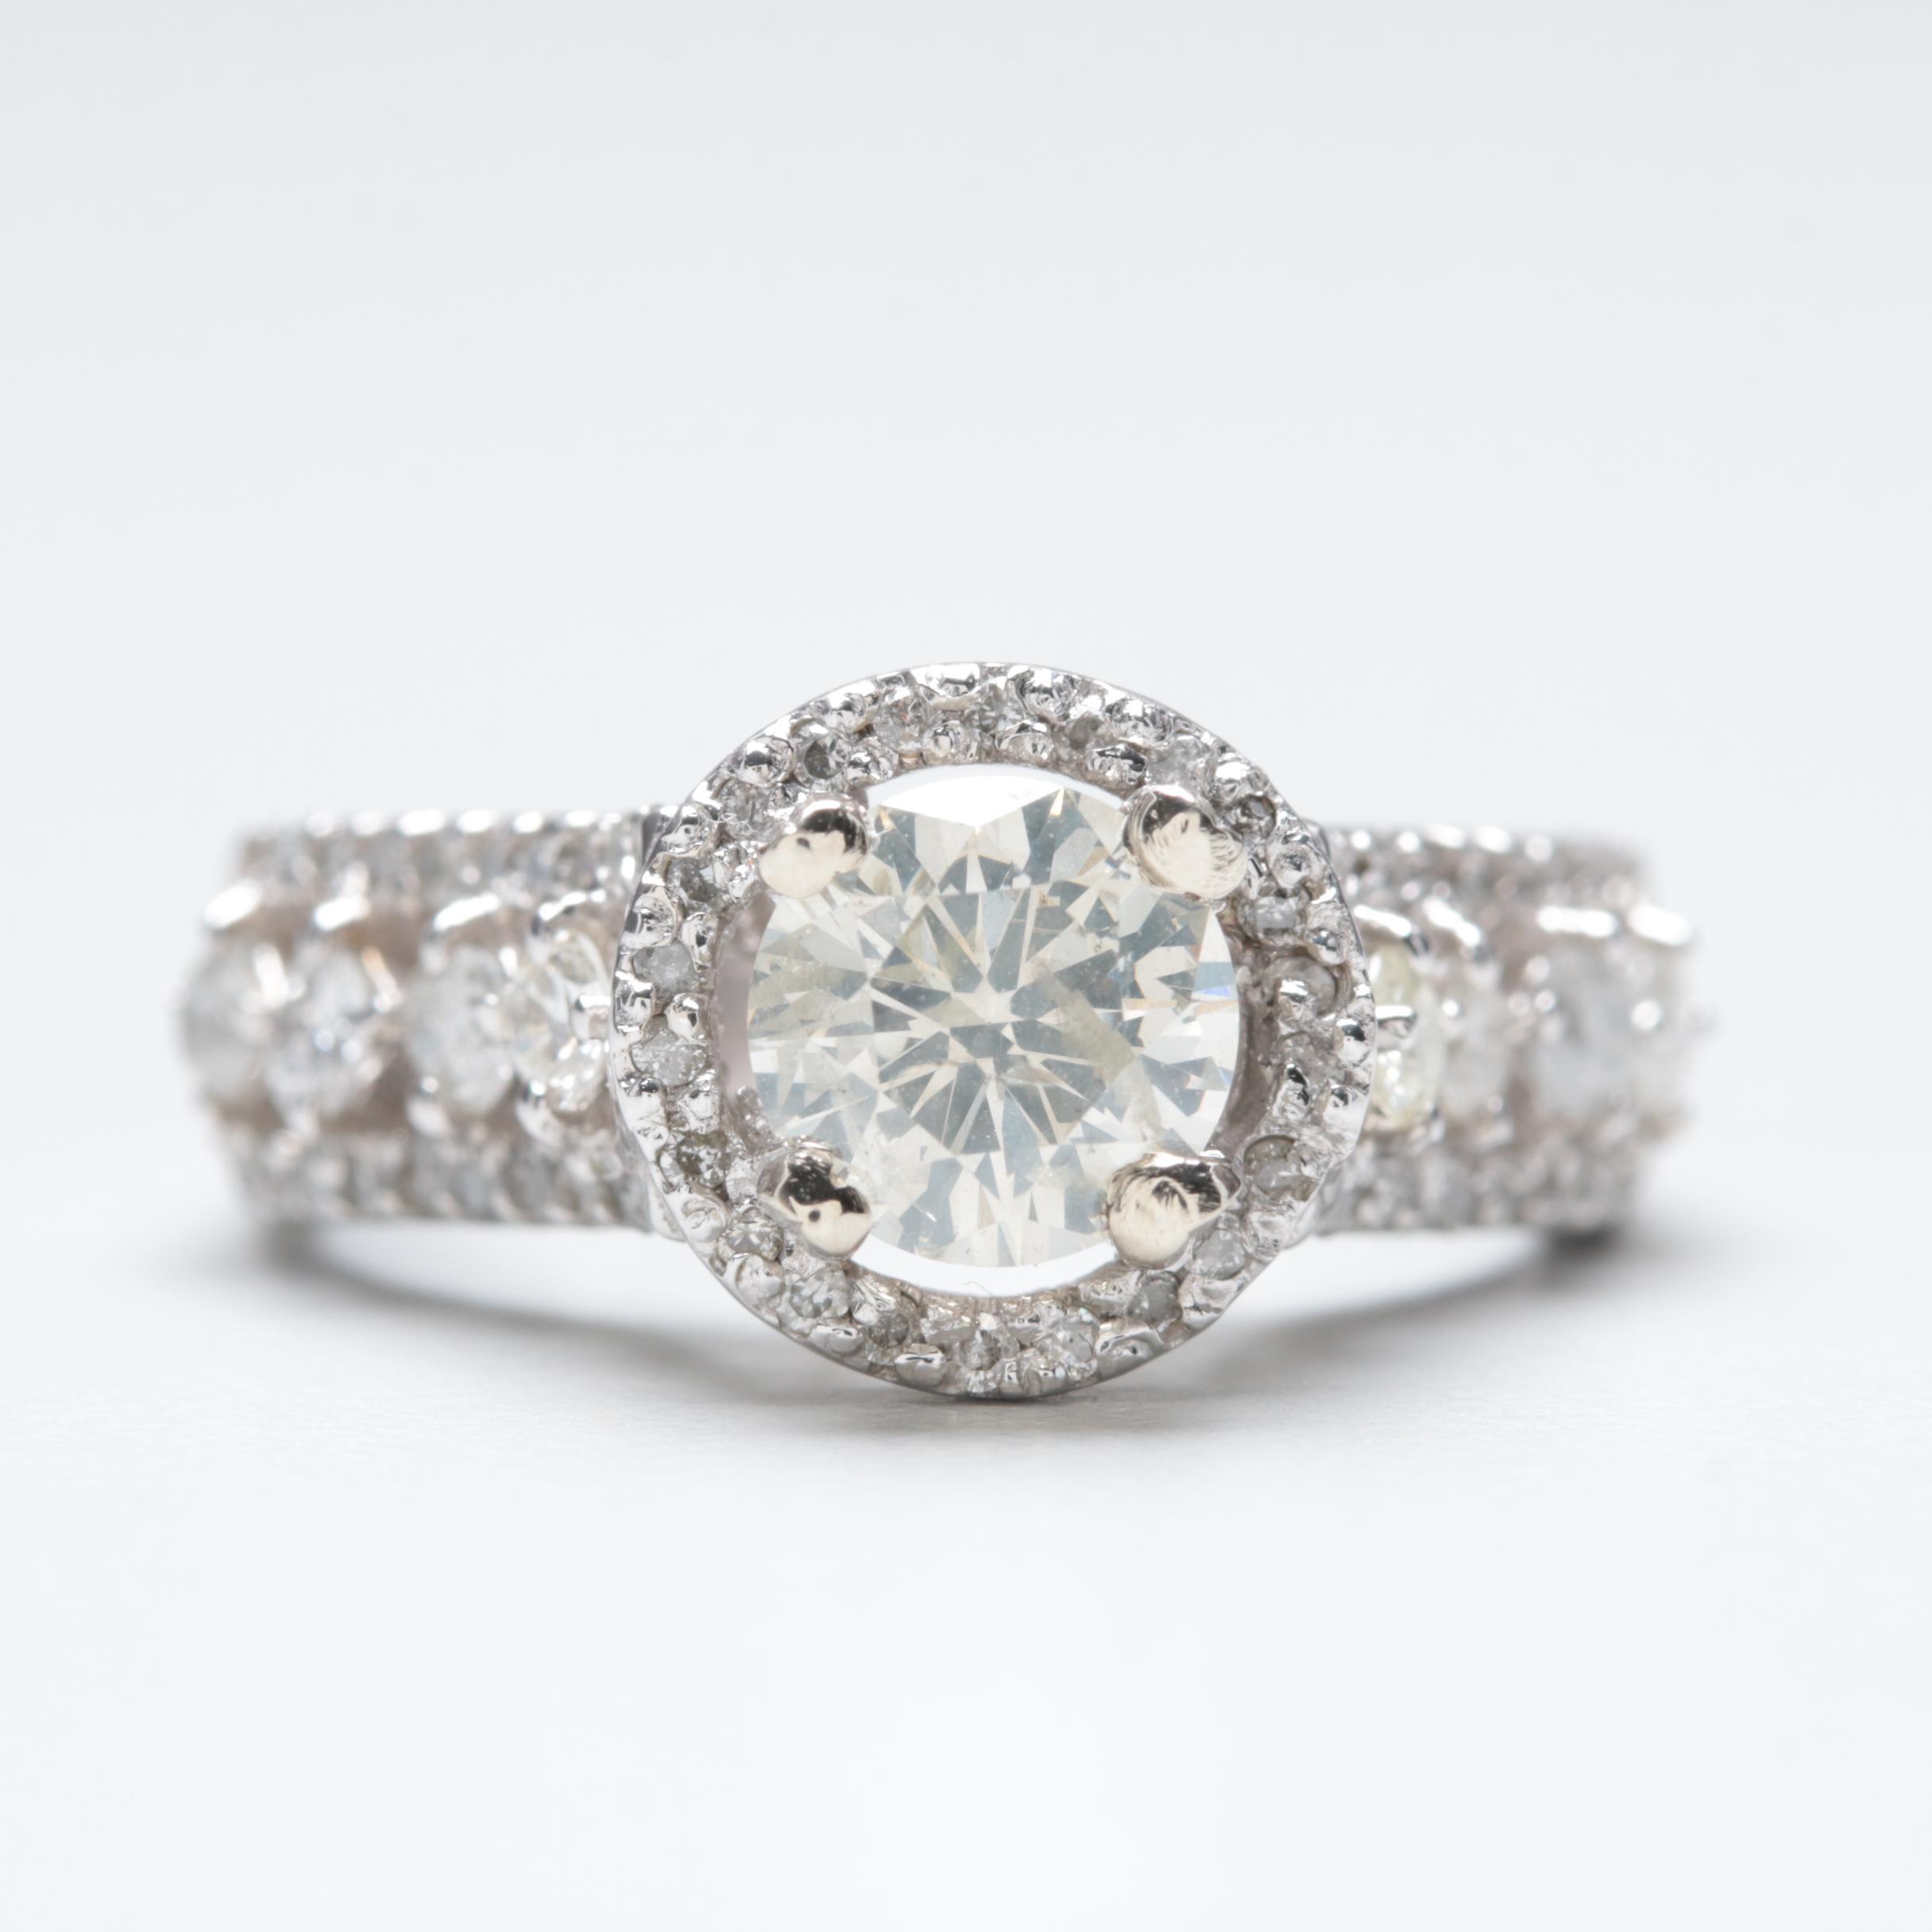 14K White Gold 1.70 CTW Diamond Ring